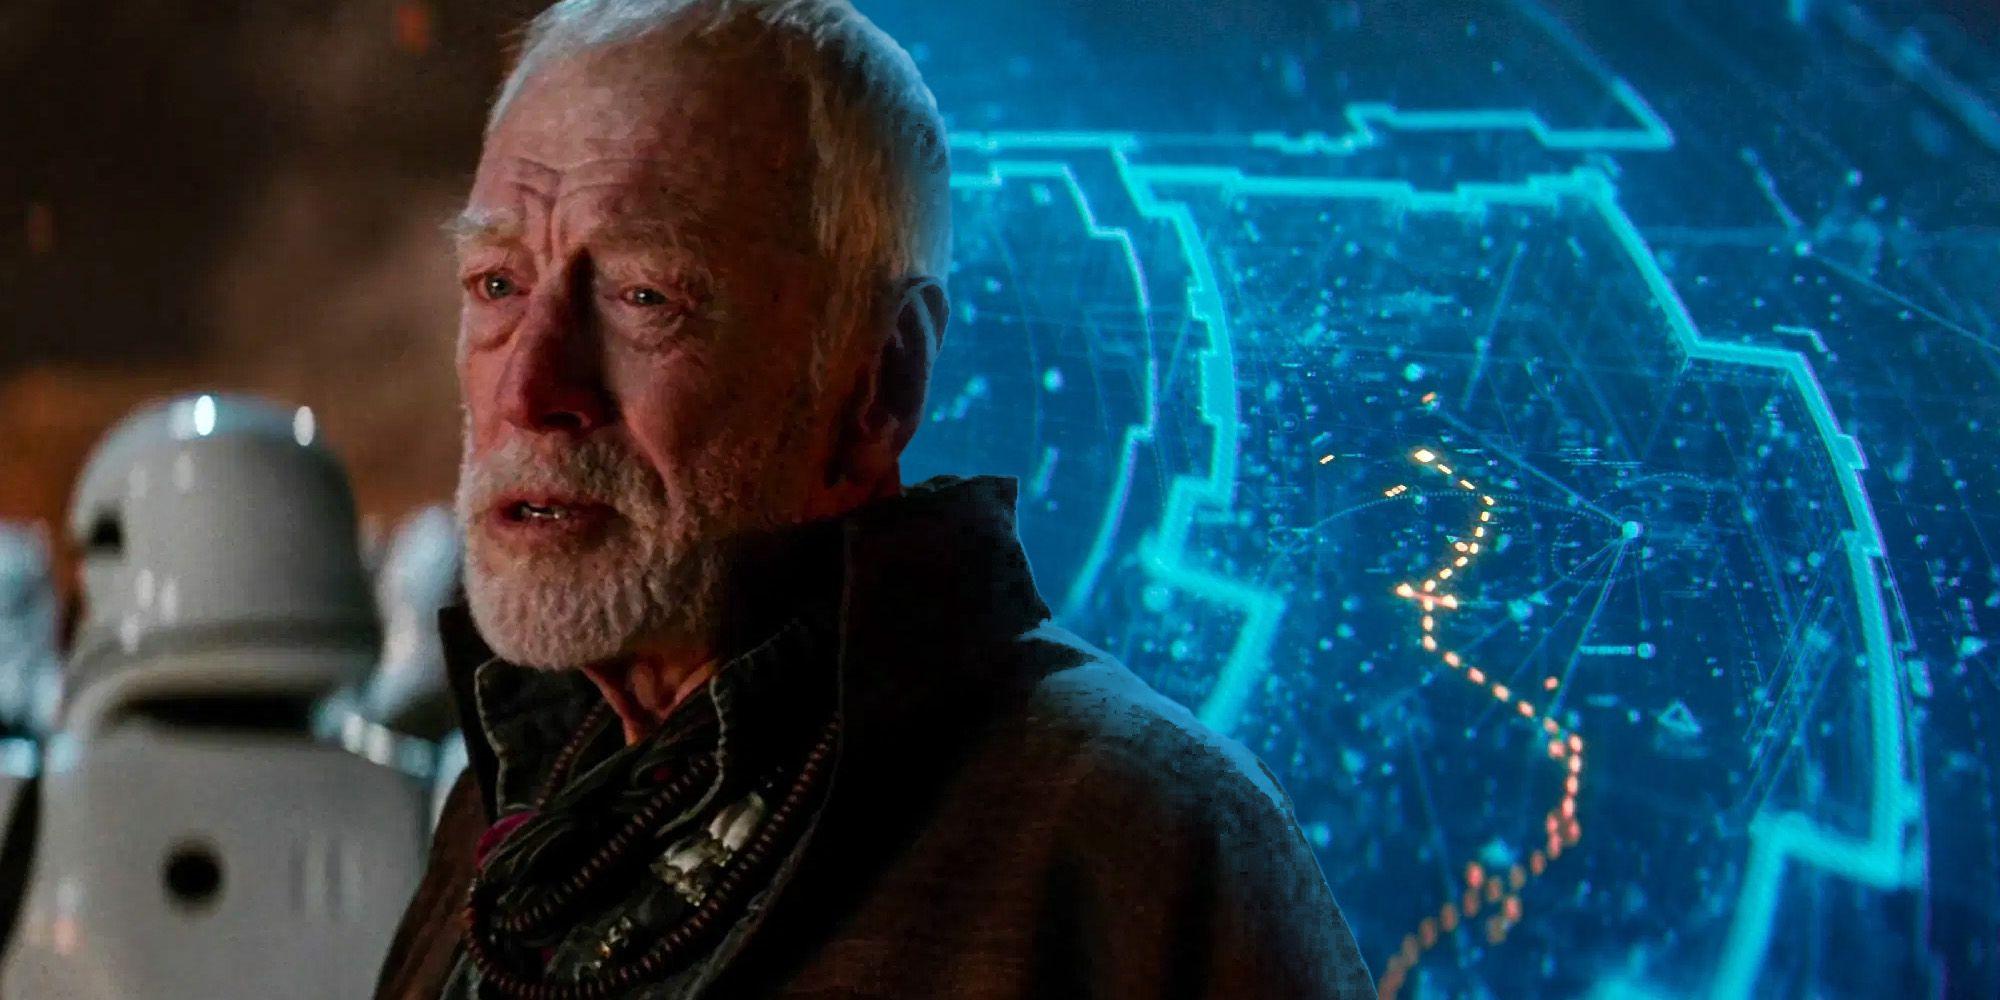 Star Wars Explains Force Awakens Map Origins (& How Lor San Tekka Got It)